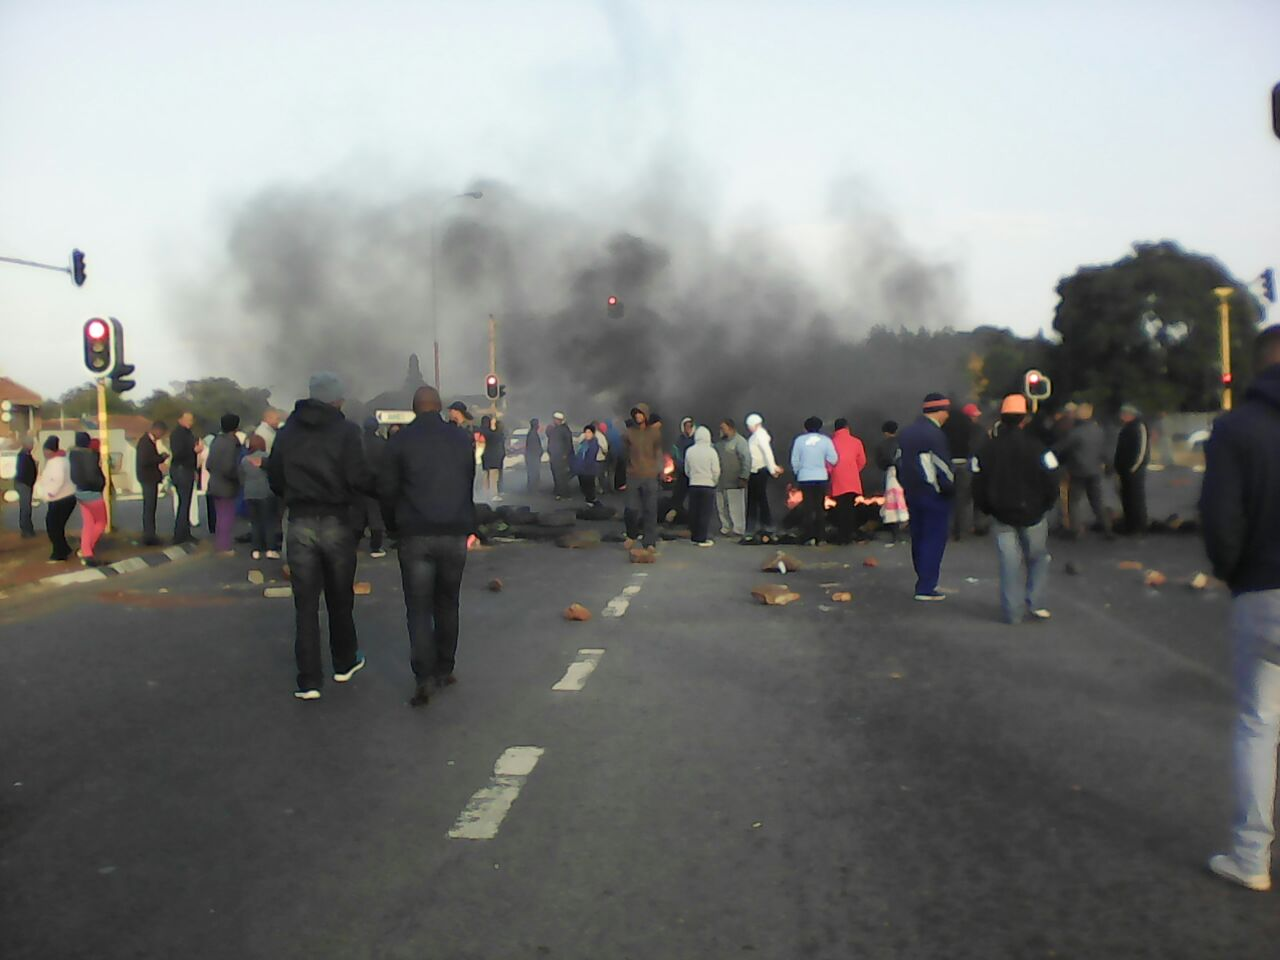 Free Jacob Zuma protests spread to Johannesburg